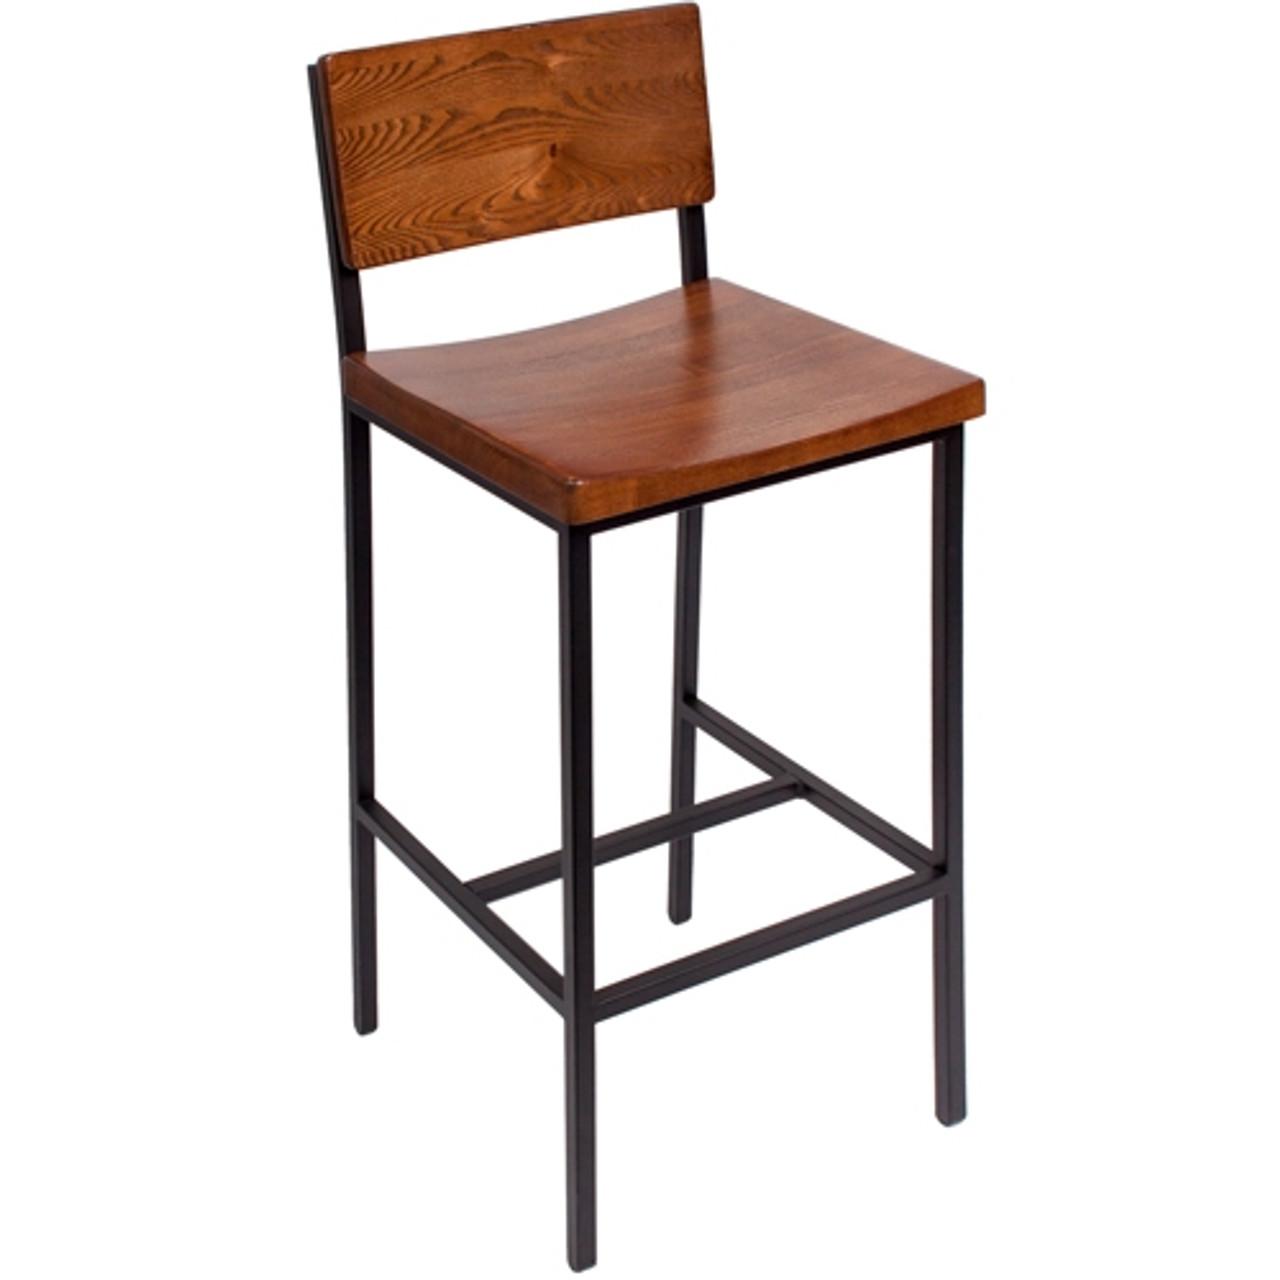 Wondrous Bfm Seating Memphis Industrial Bar Stool Js33Bash Sb Ibusinesslaw Wood Chair Design Ideas Ibusinesslaworg